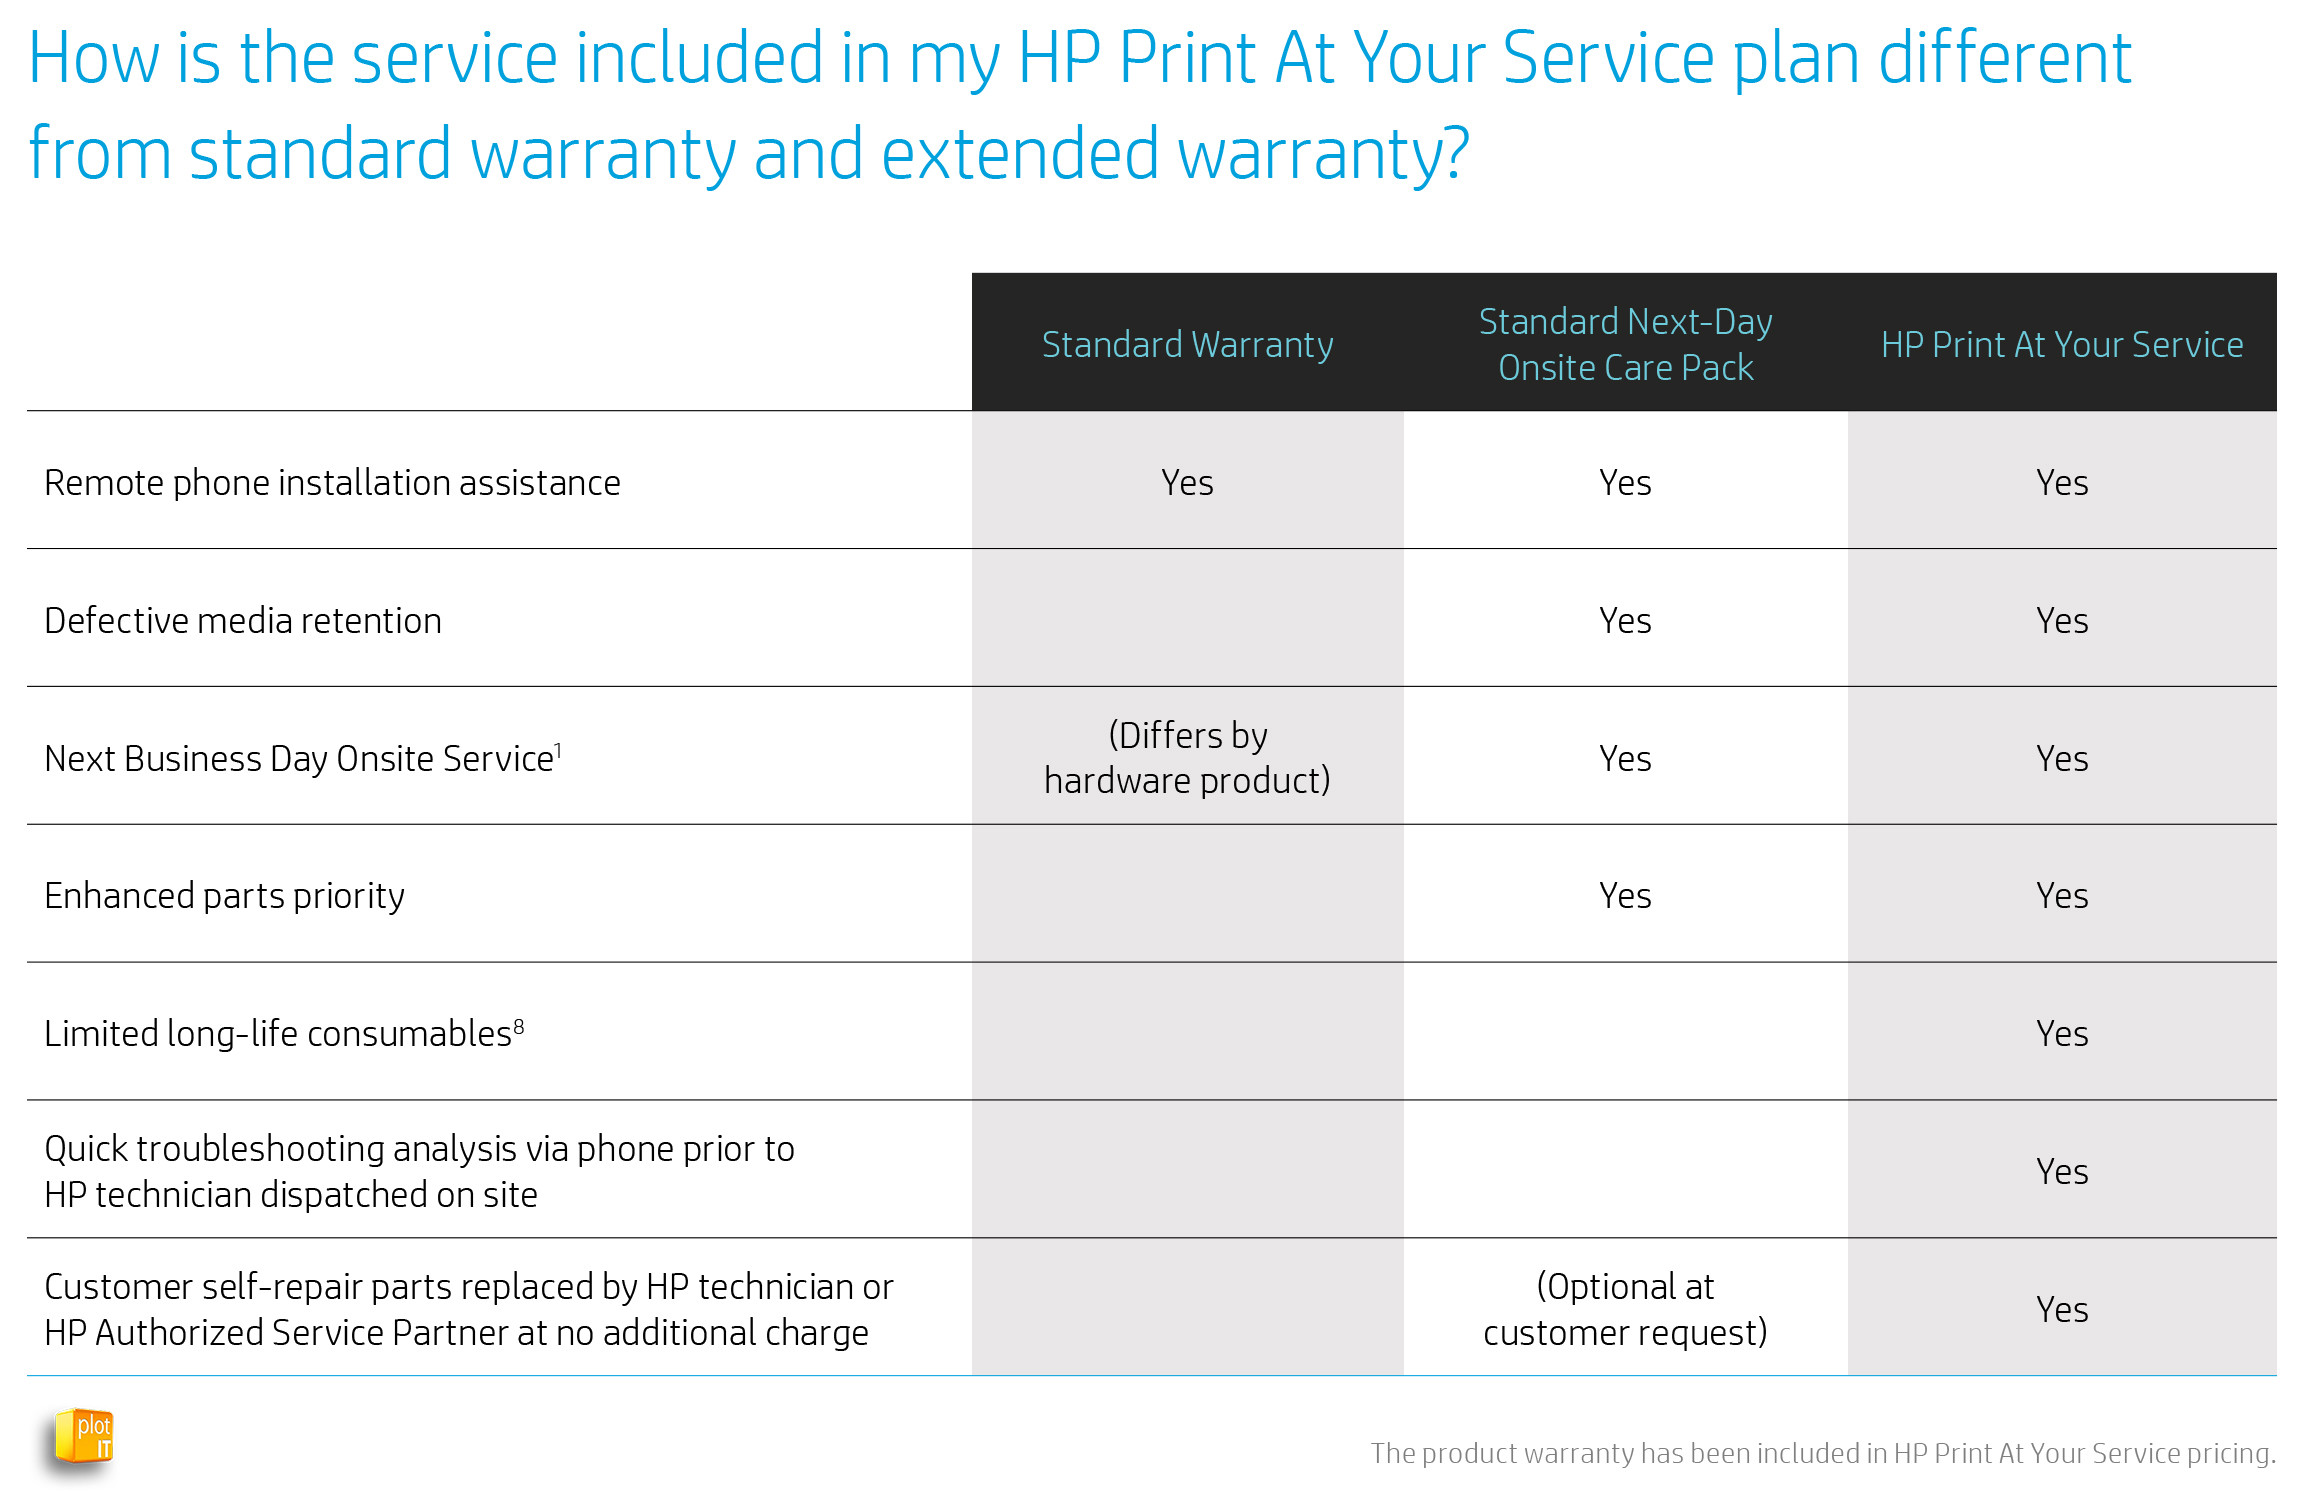 HP_PRINT @ YOUR SERVICE_SERVICE PLAN_PLOT-IT